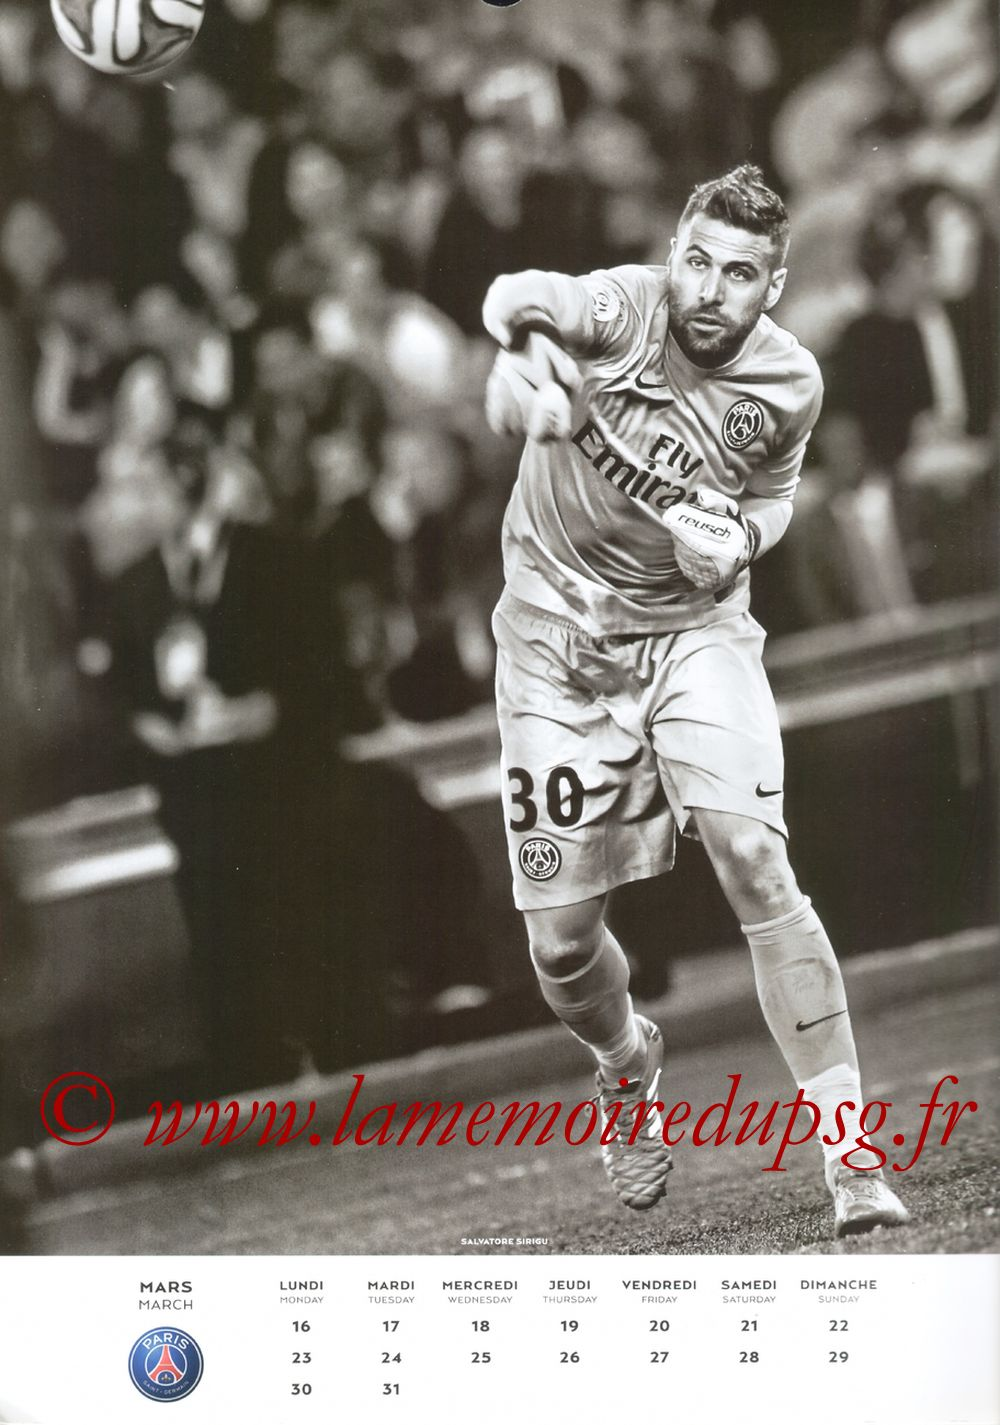 Calendrier PSG 2015 - Page 06 - Salvatore SIRIGU